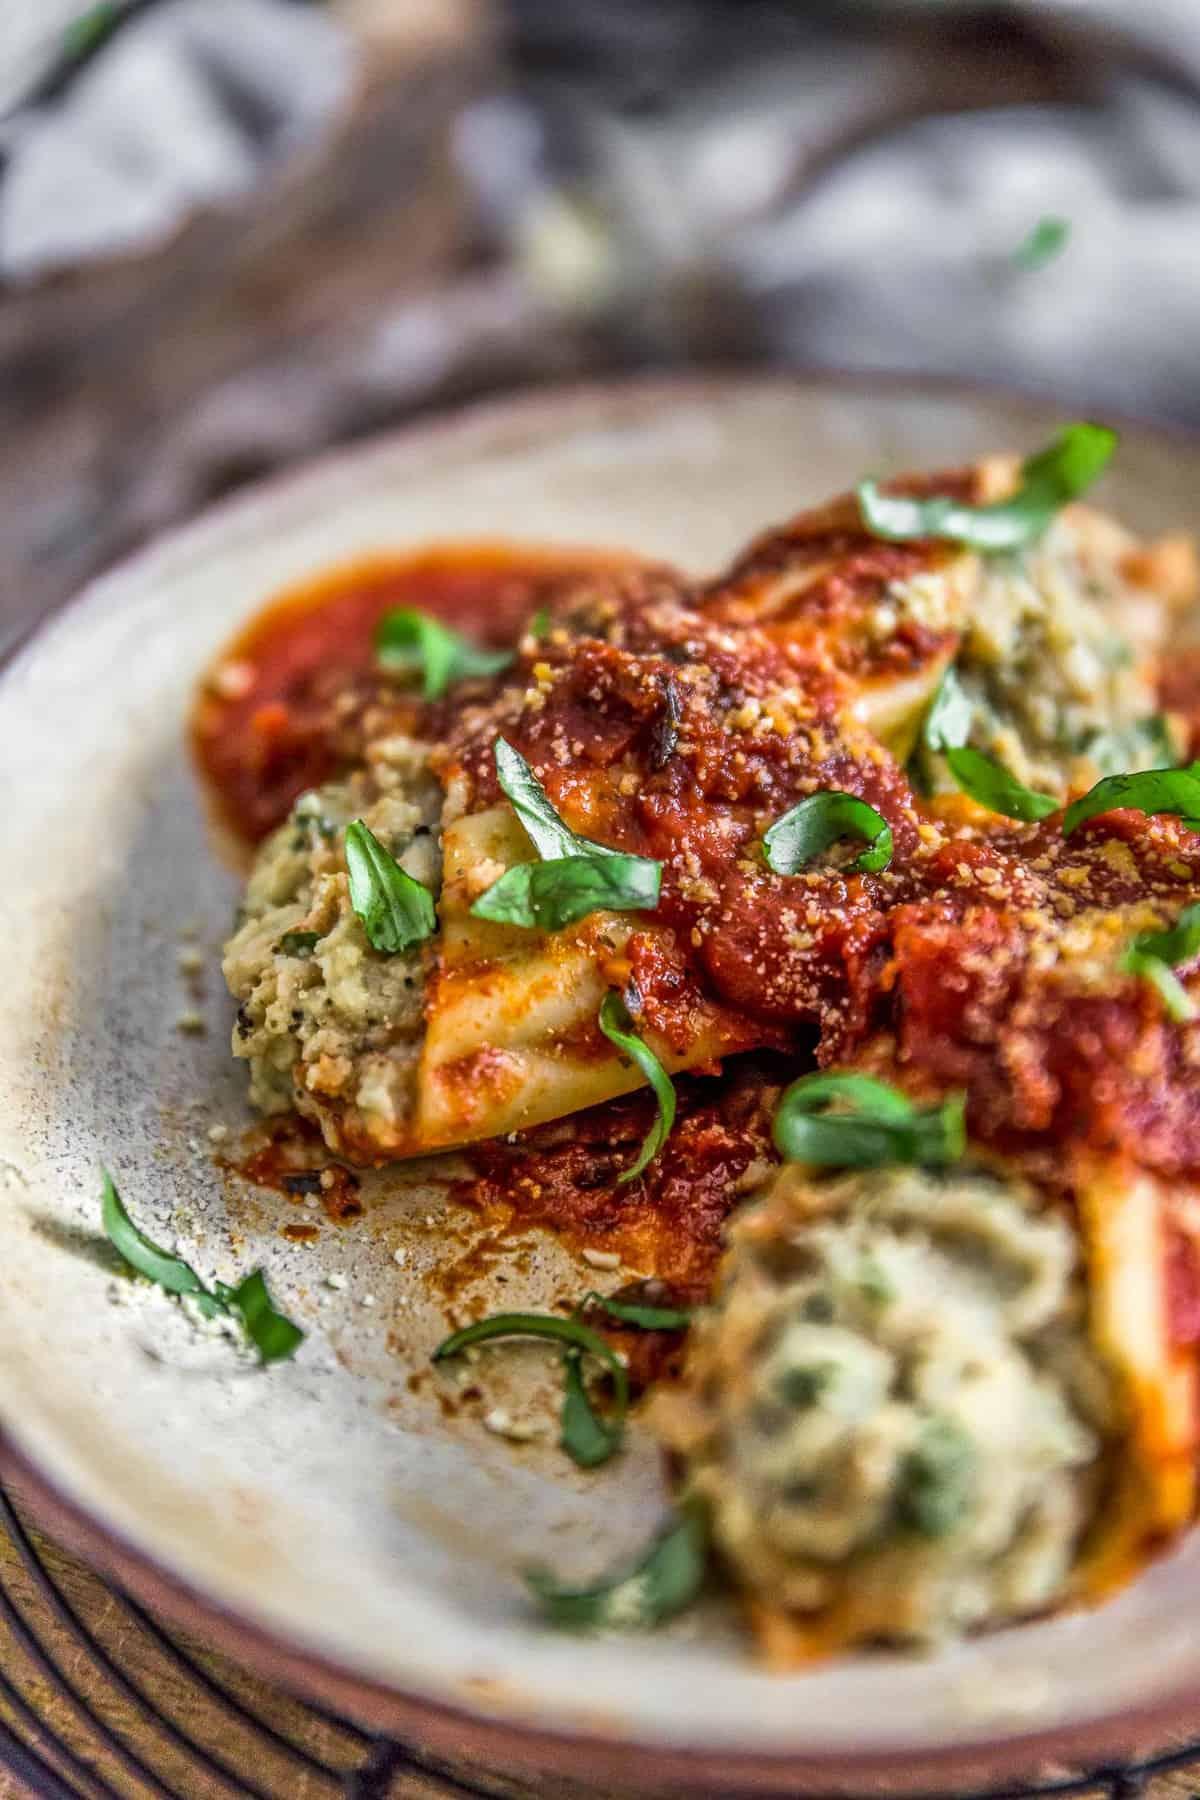 Close up of Vegan Manicotti Stuffed with Cauliflower Cream and Spinach